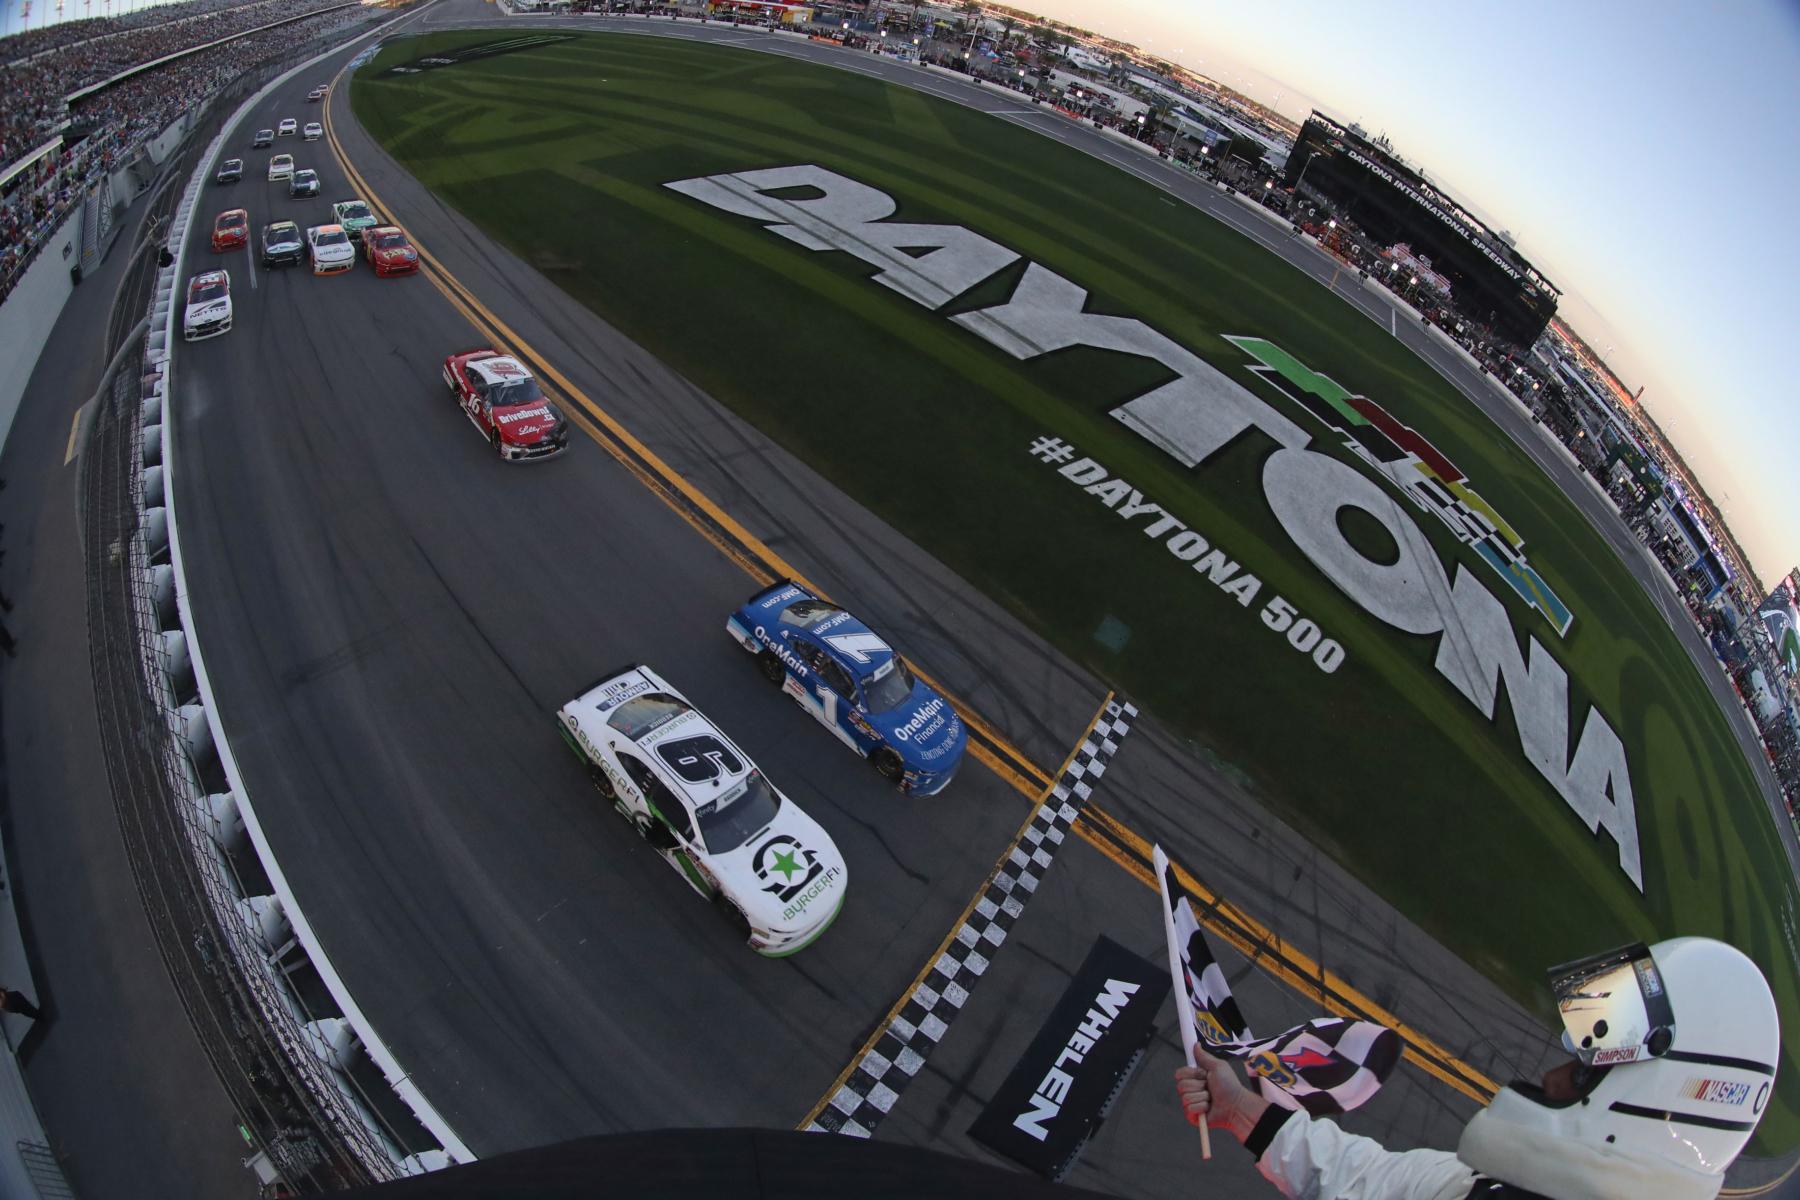 2018 NASCAR Xfinity Series finish at Daytona